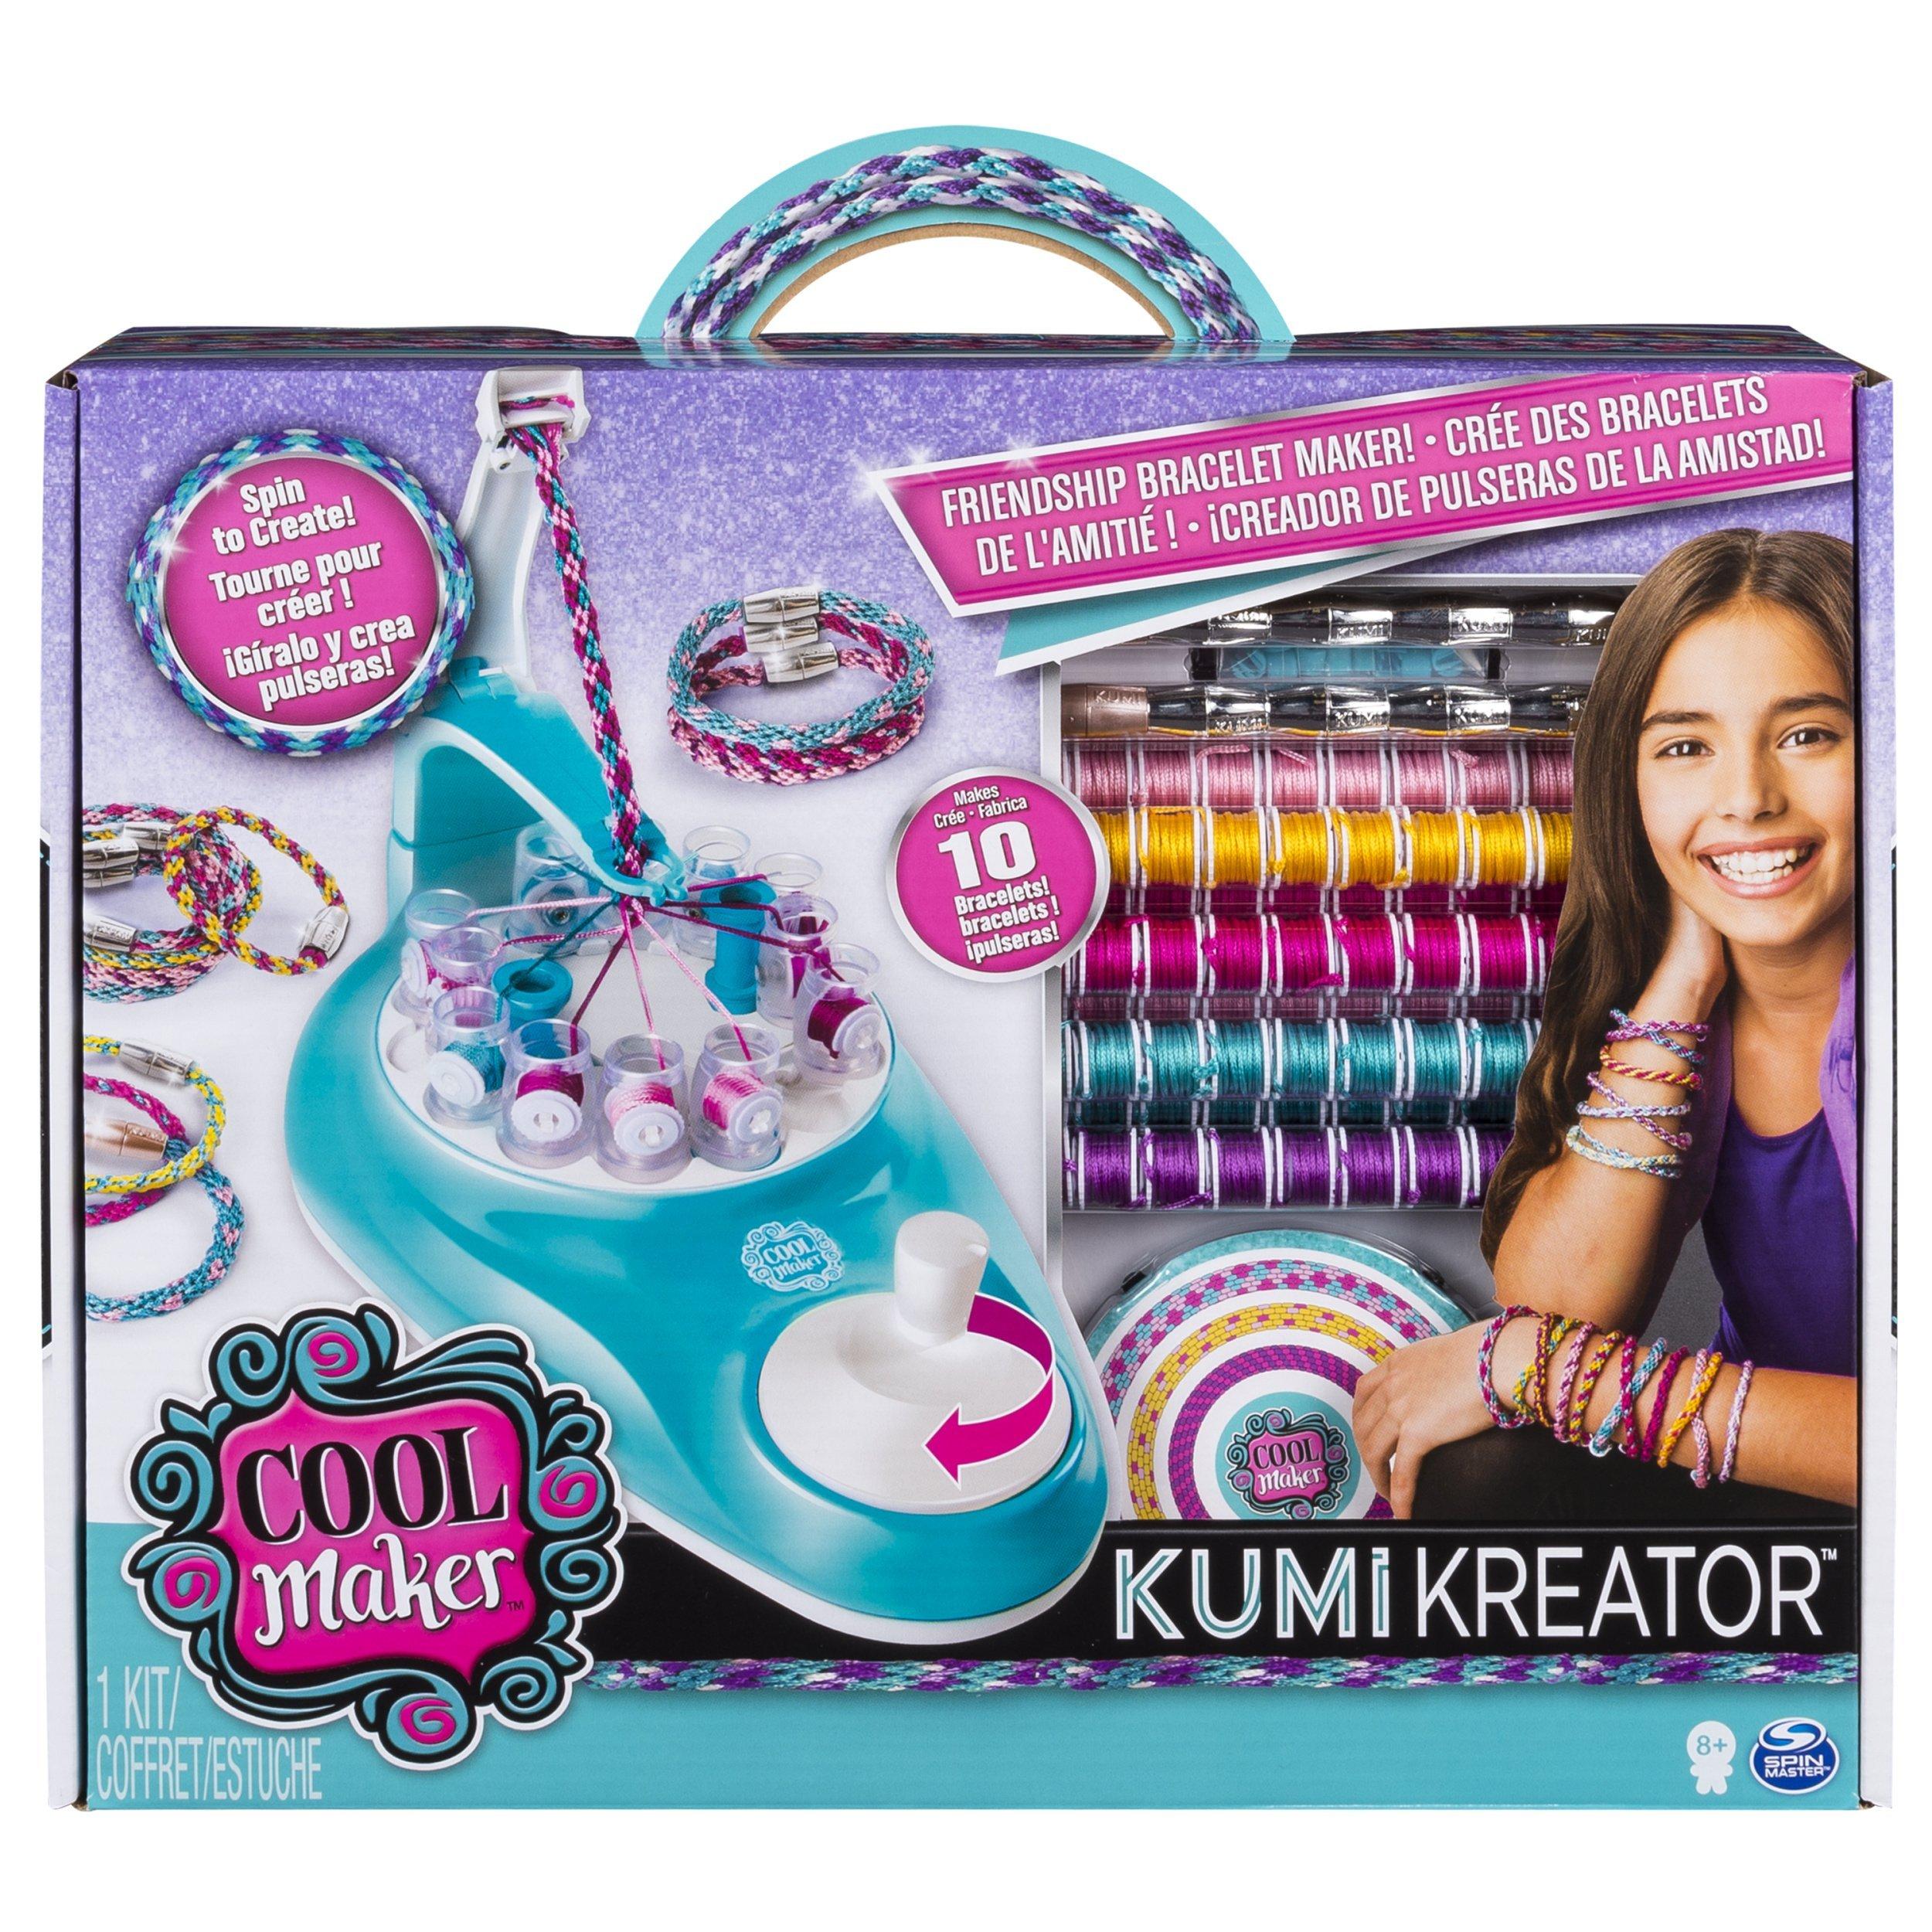 Cool Maker - 6038301 - Loisirs Créatifs - Kumi Kreator product image